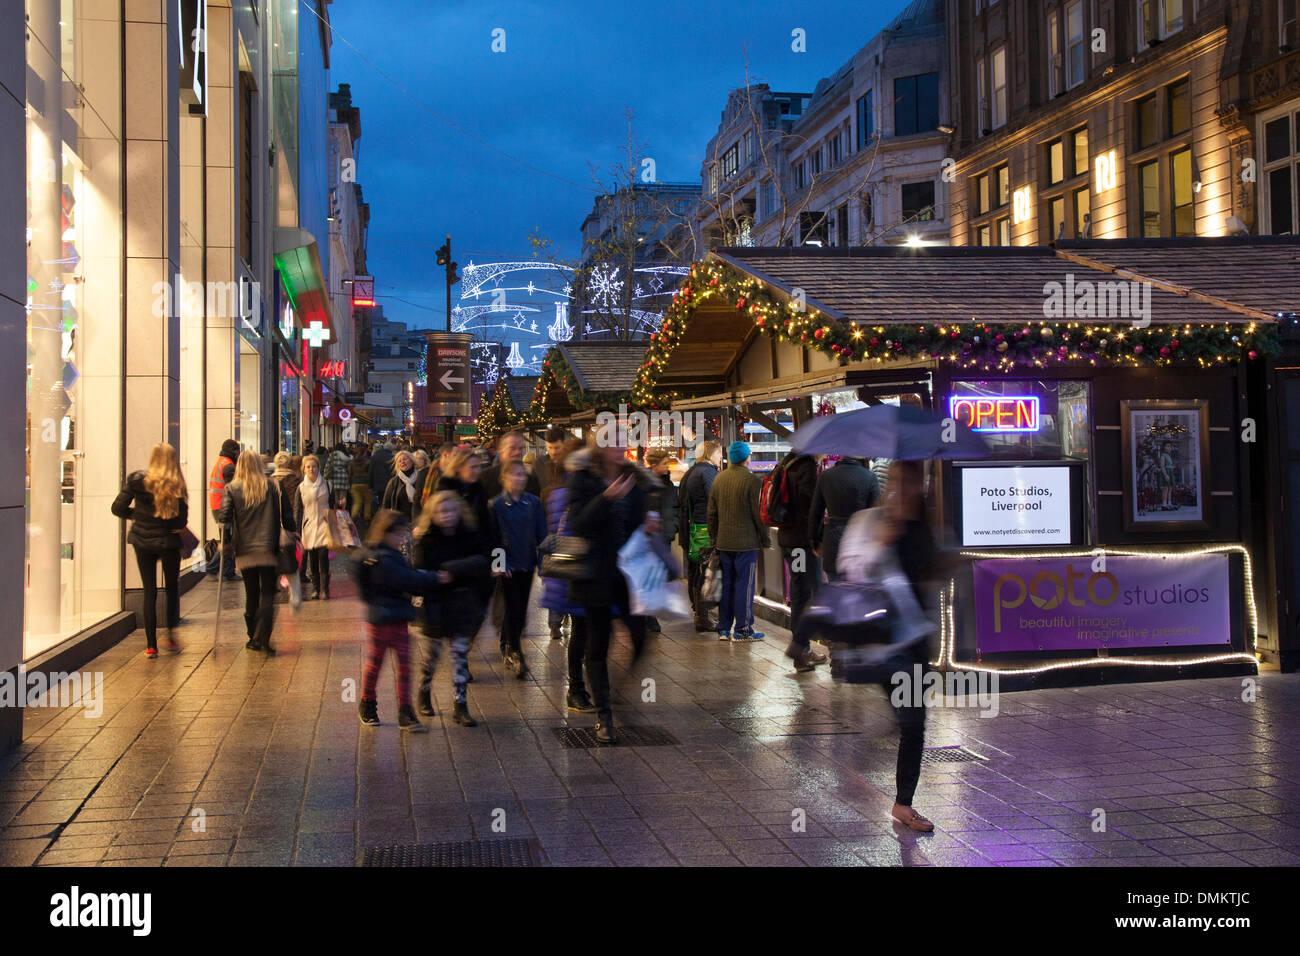 Liverpool One, Merseyside, UK 15. Dezember 2013. Church Street, wo ...